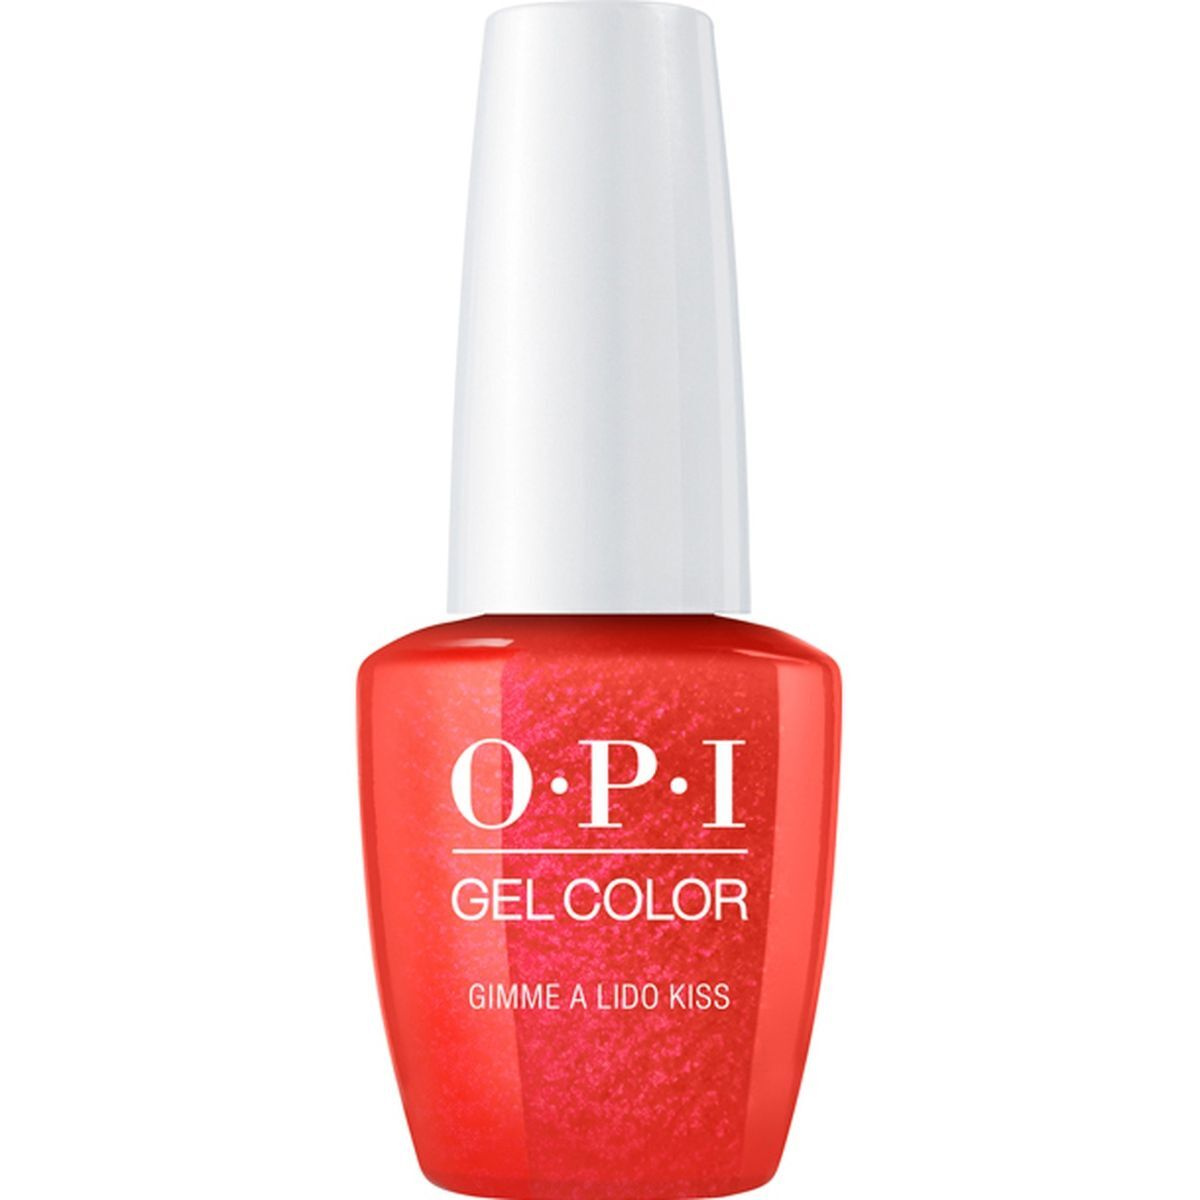 OPI Гель-лак для ногтей GelColor Gimme a Lido Kissl, 15 мл #1